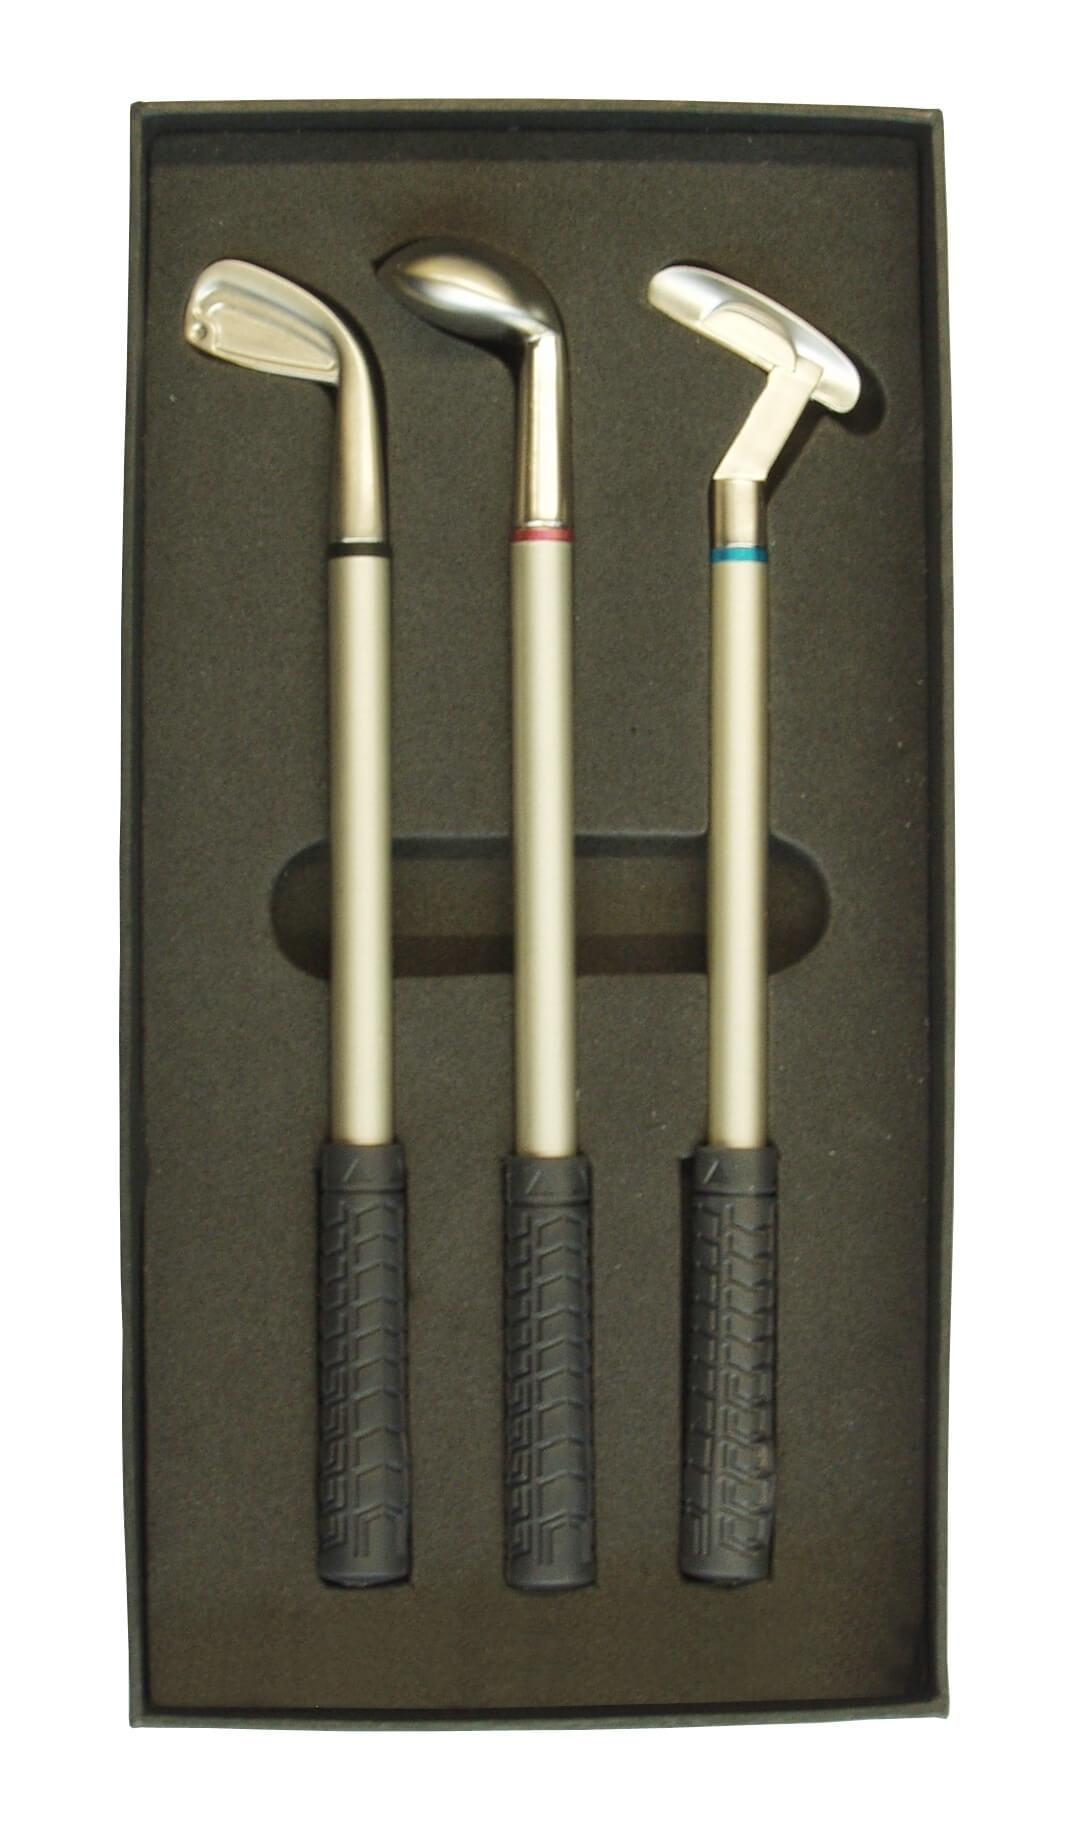 Golfschläger Kugelschreiber